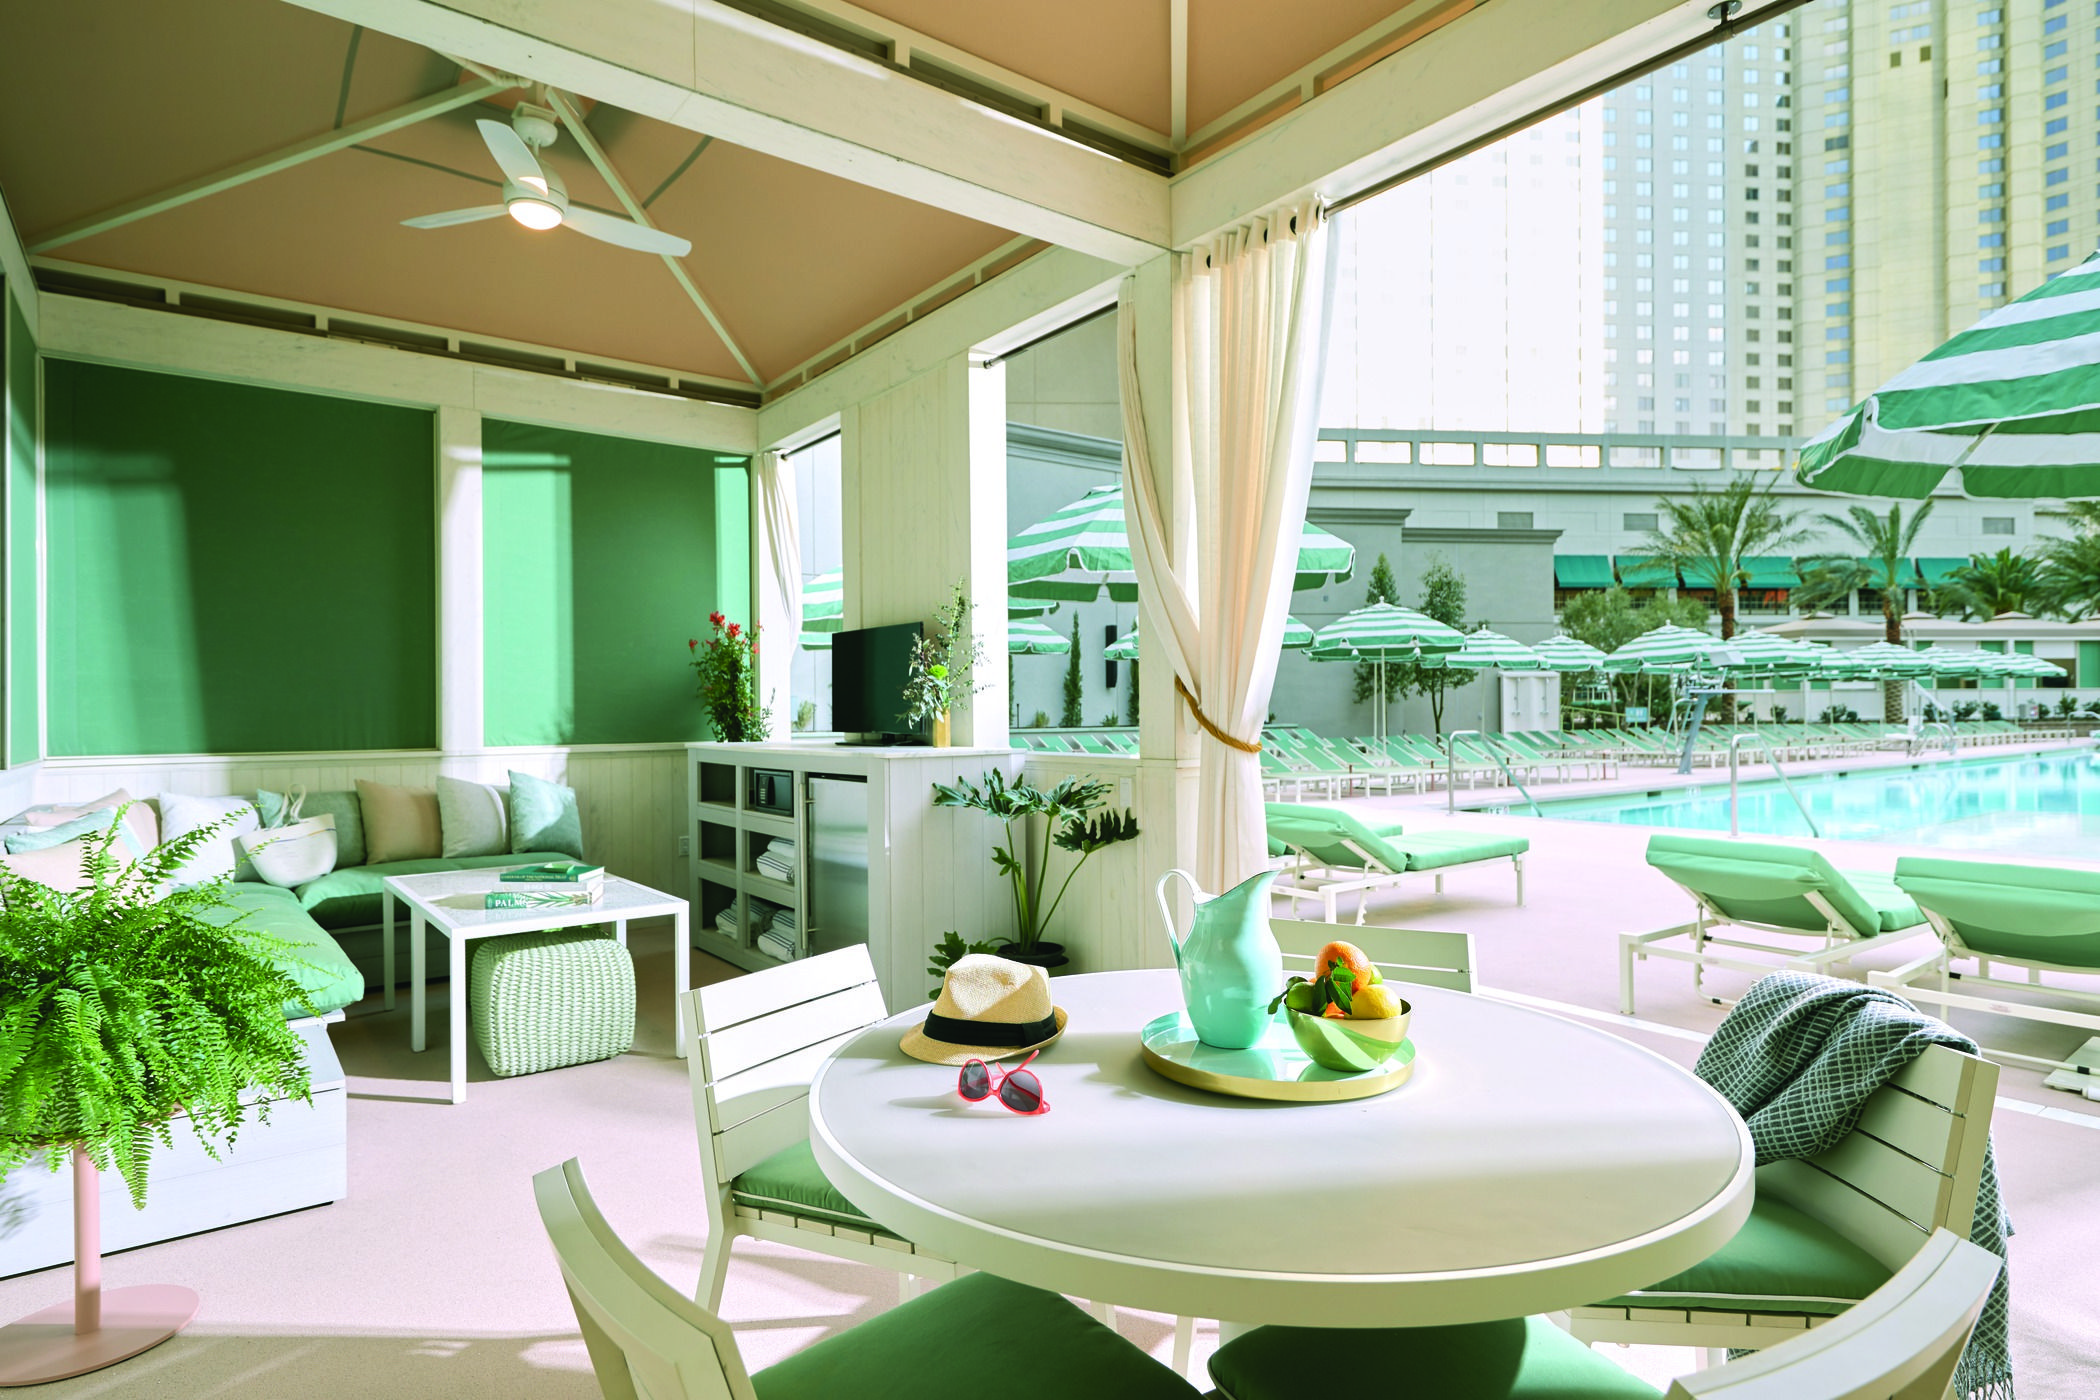 Park Mgm Las Vegas The Perfect Cabana For A Girls Trip To Las Vegas Best Las Vegas Hotels Las Vegas Hotels Vegas Hotel